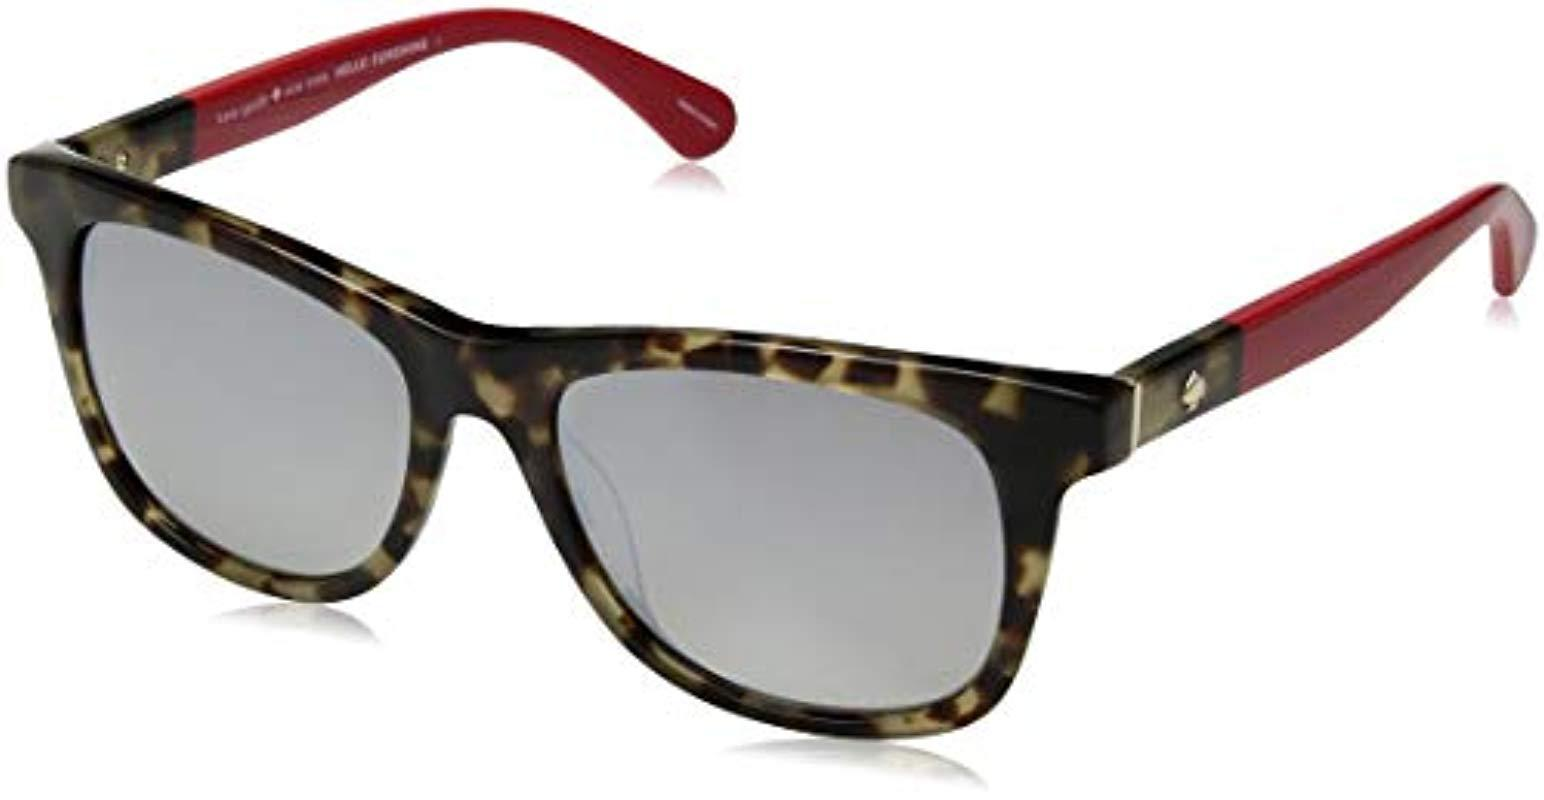 2bf6903fb5 Kate Spade. Women s Kate Spade Charmine s Rectangular Sunglasses ...